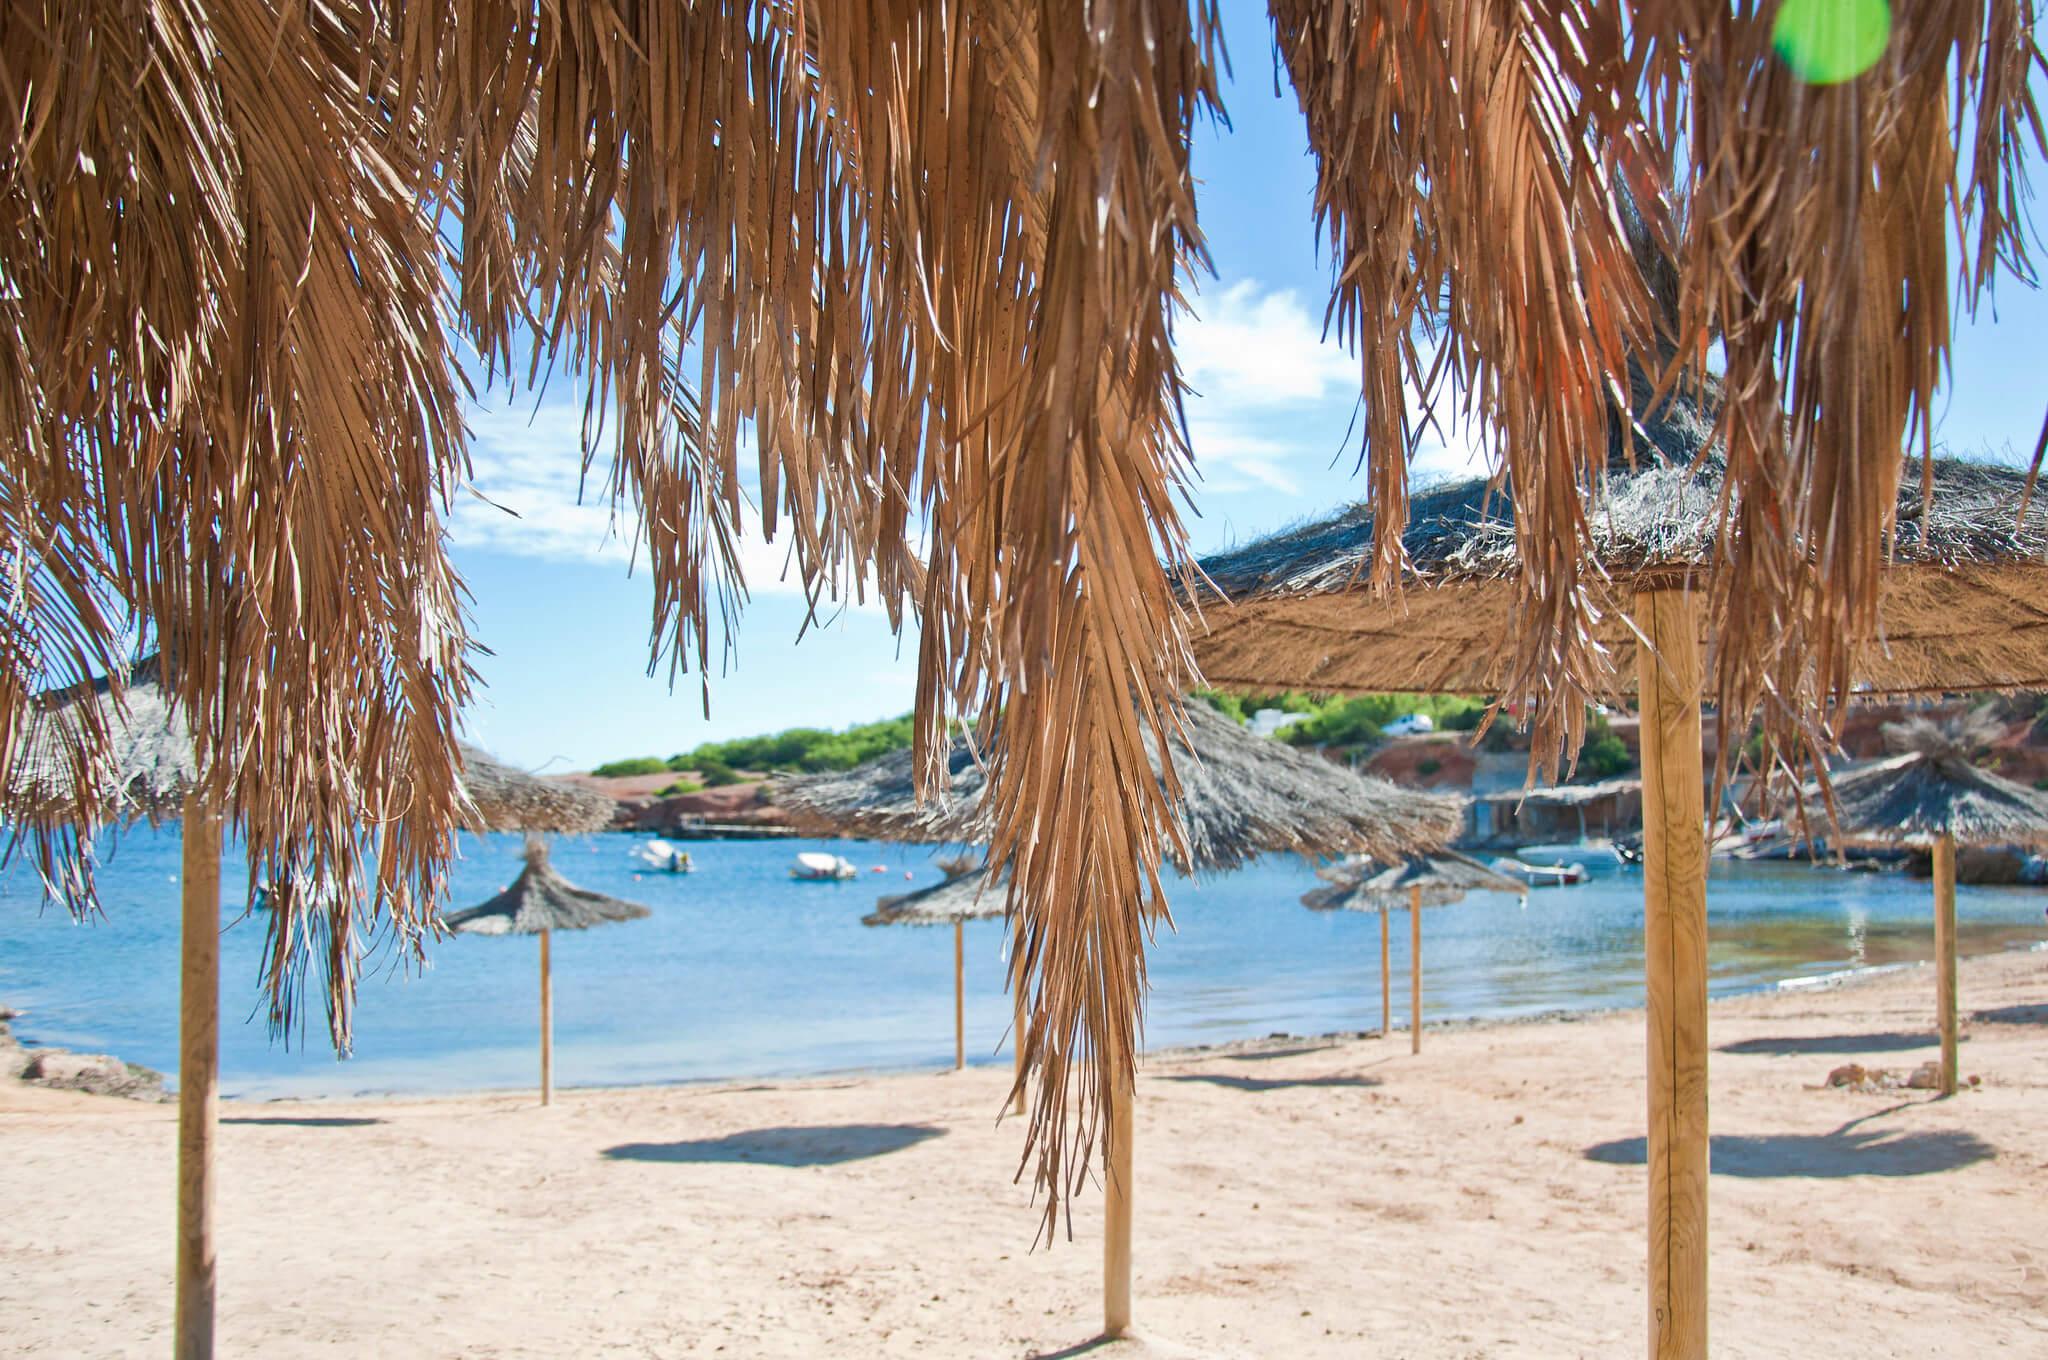 https://www.white-ibiza.com/wp-content/uploads/2020/03/ibiza-beaches-pou-des-lleo-05.jpg